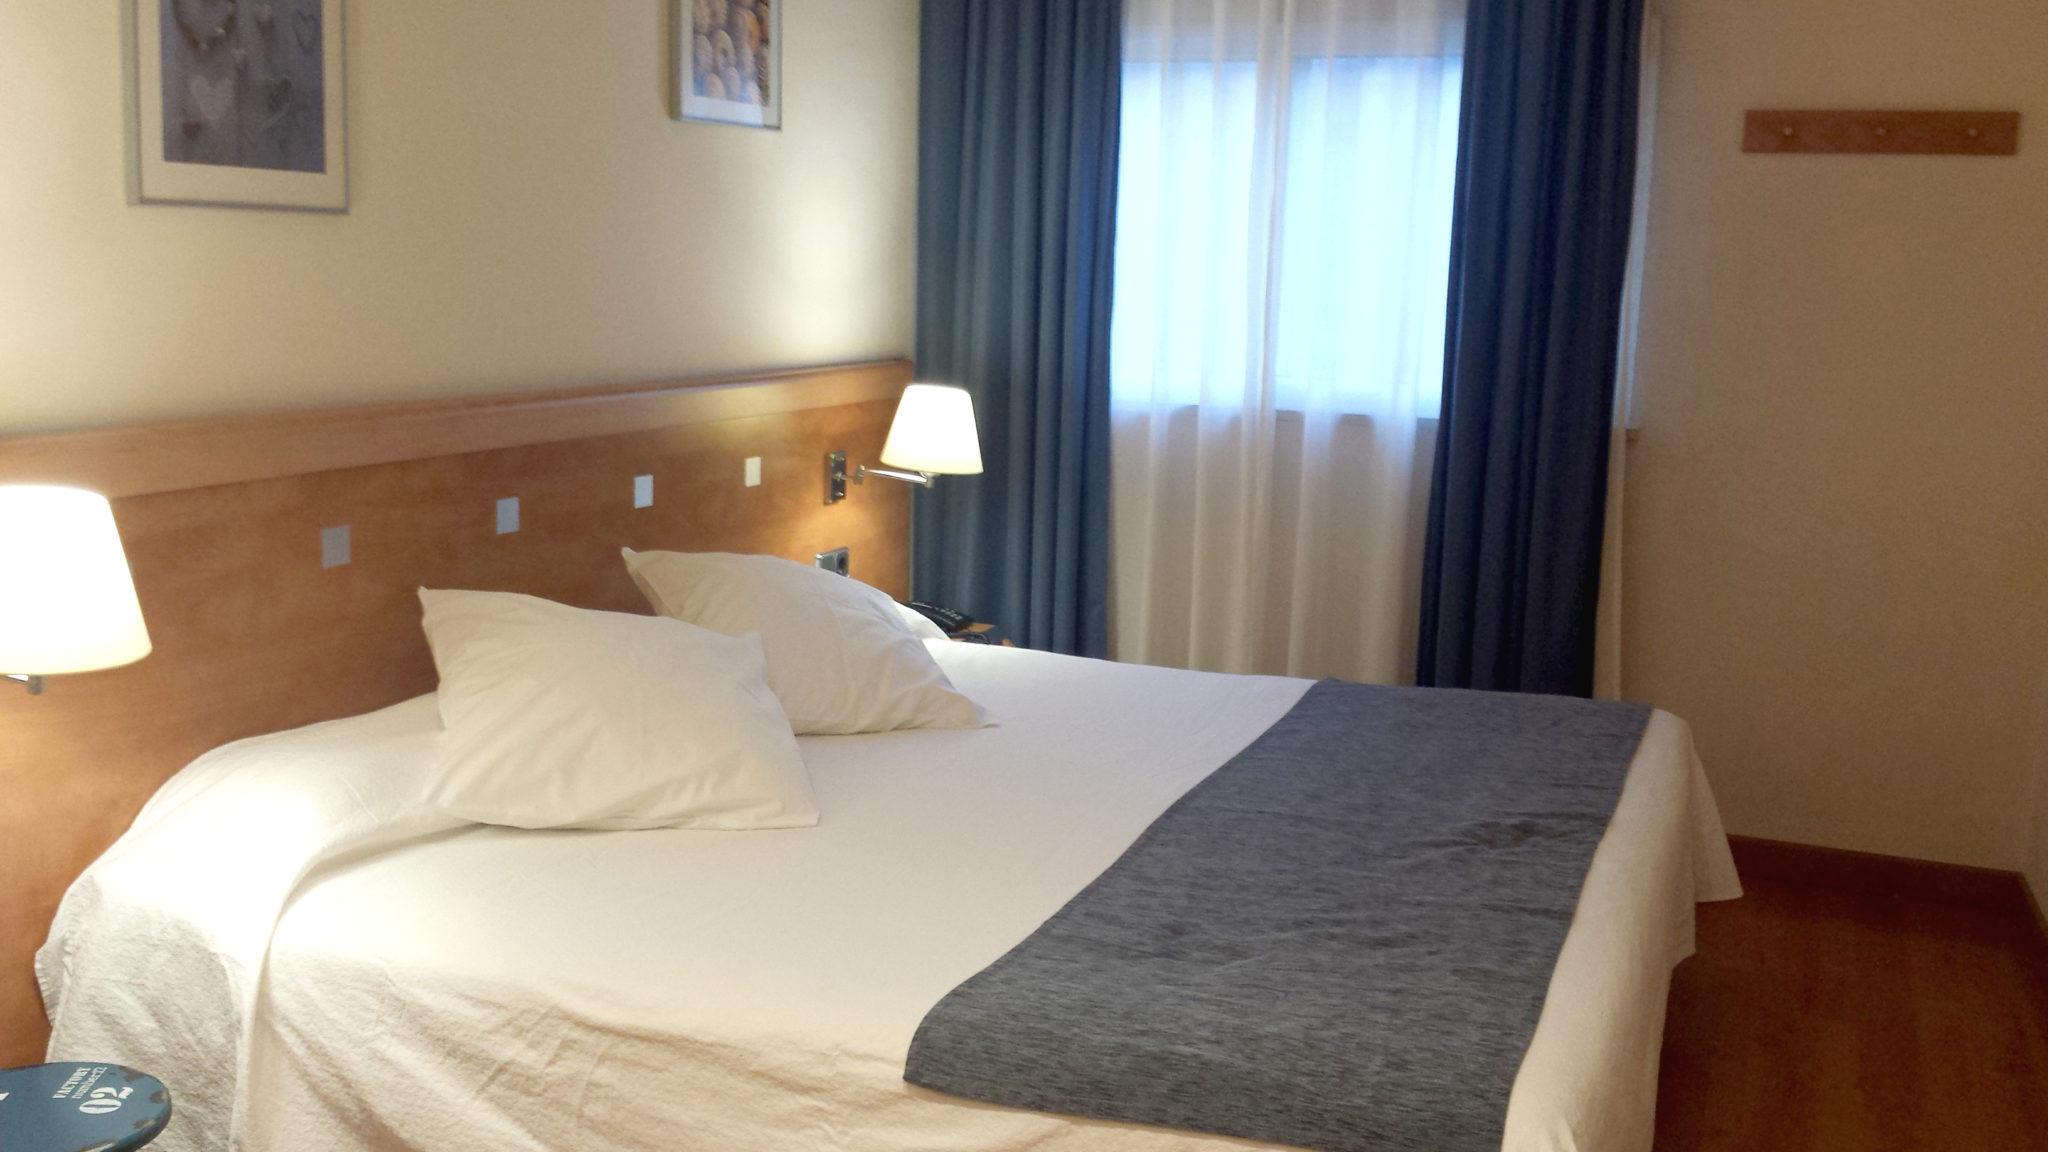 Hema_pose_ses_valises_barcelone_cityguide_hotel_antibes